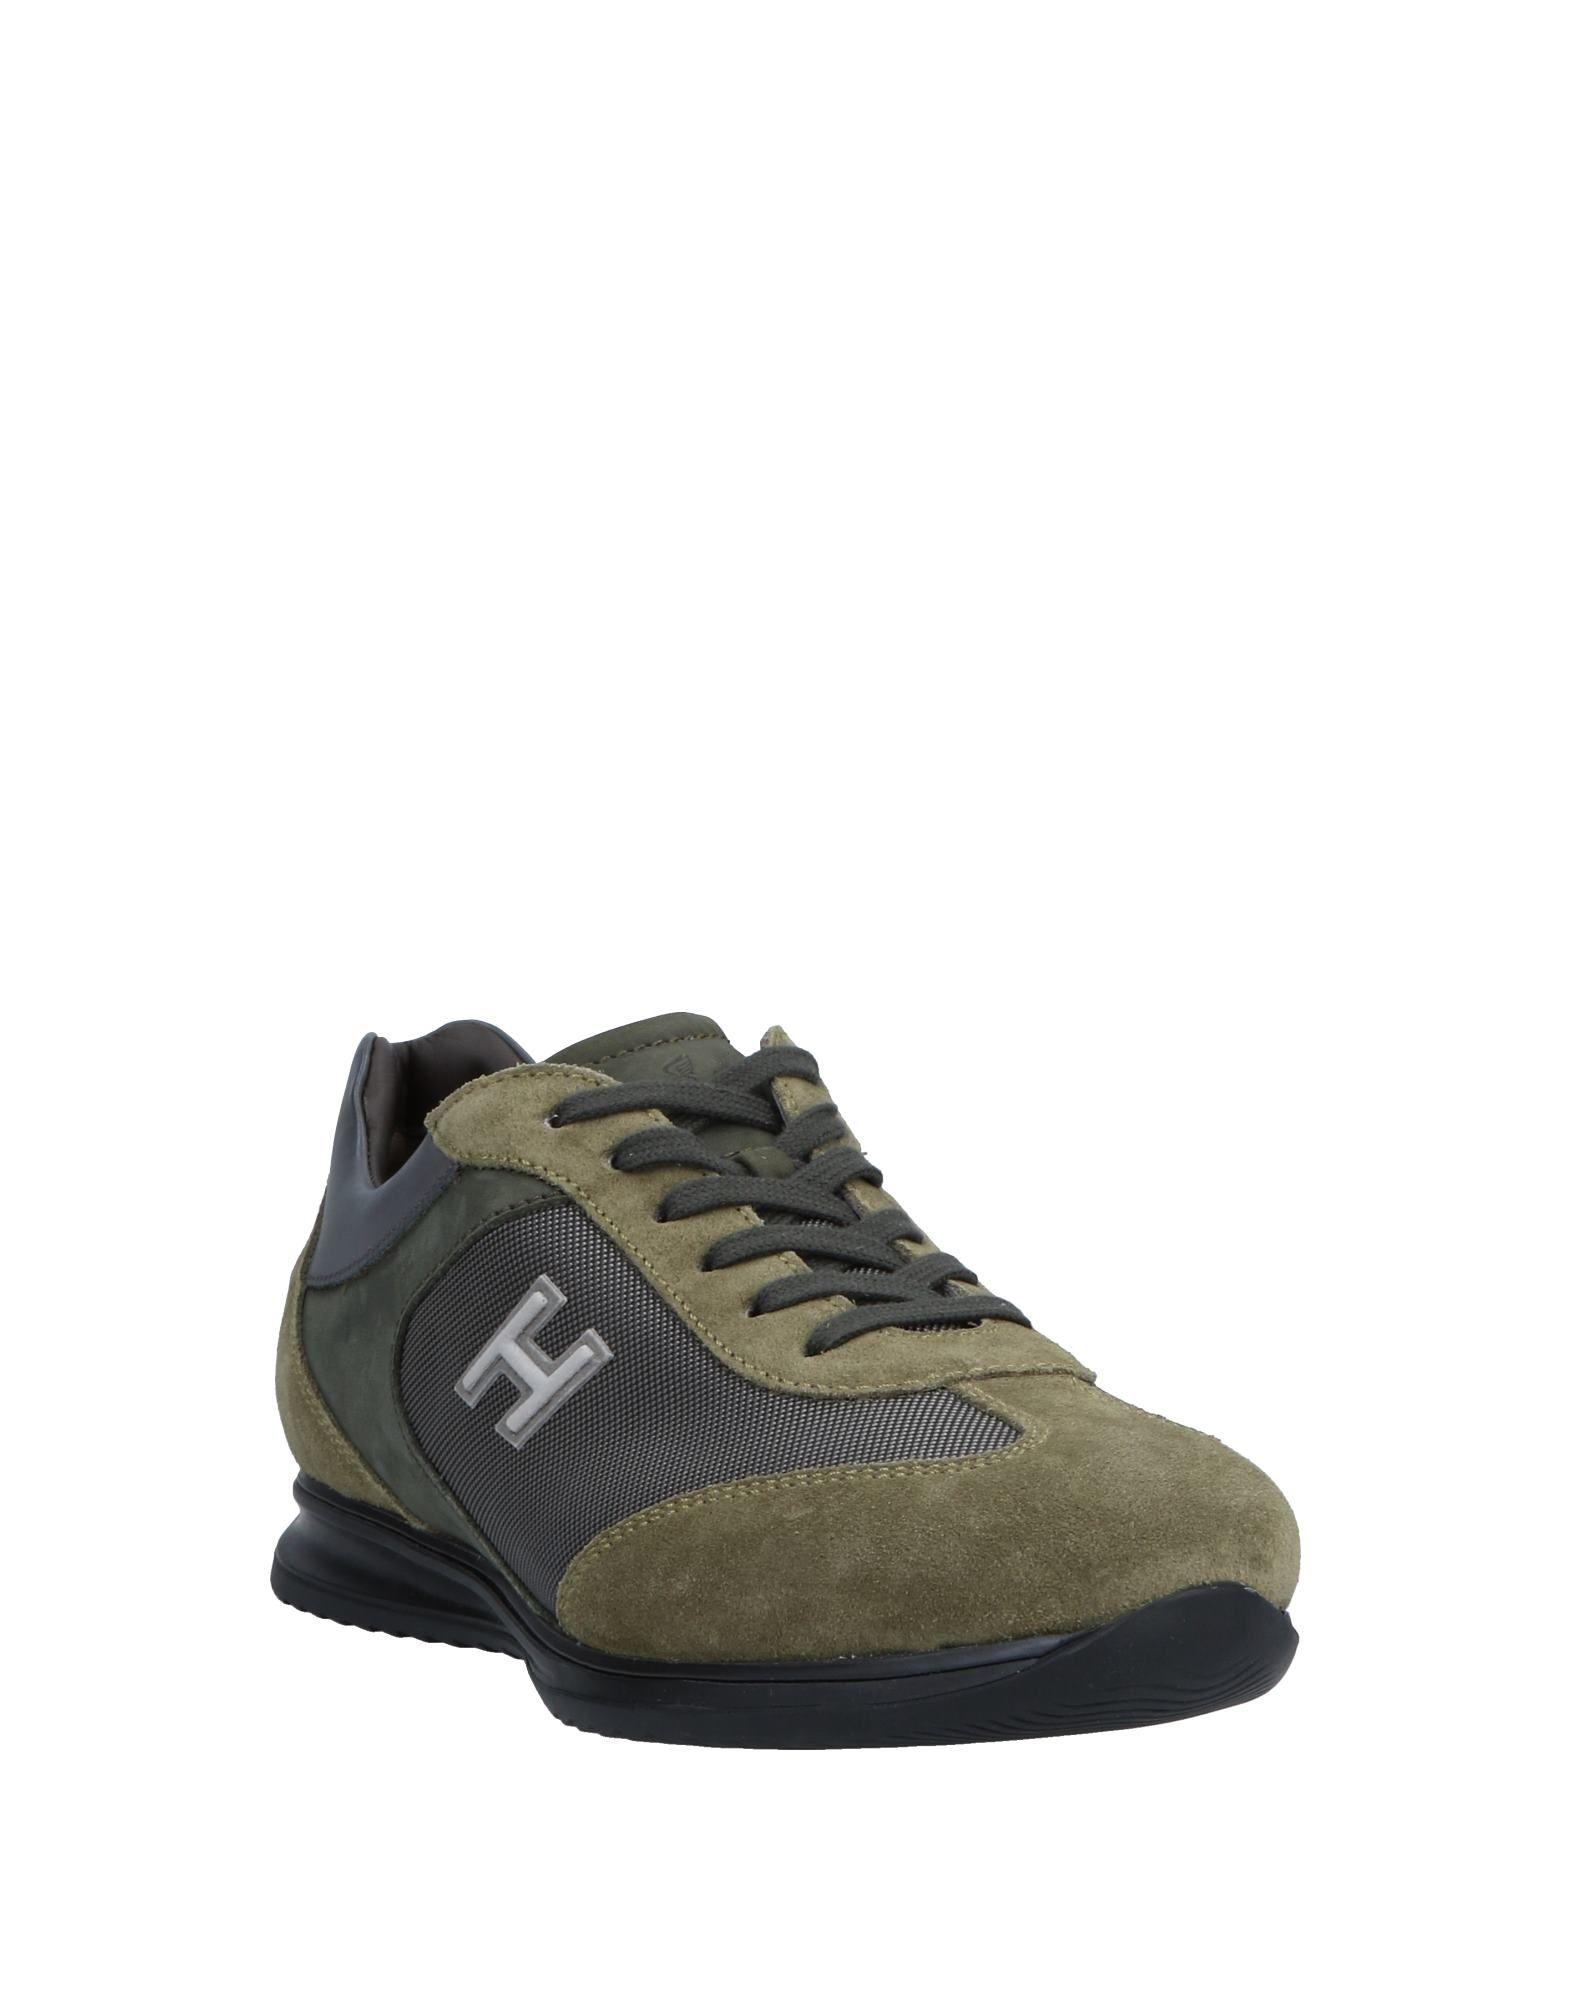 Hogan Sneakers Herren Qualität  11288755RJ Gute Qualität Herren beliebte Schuhe 13e269